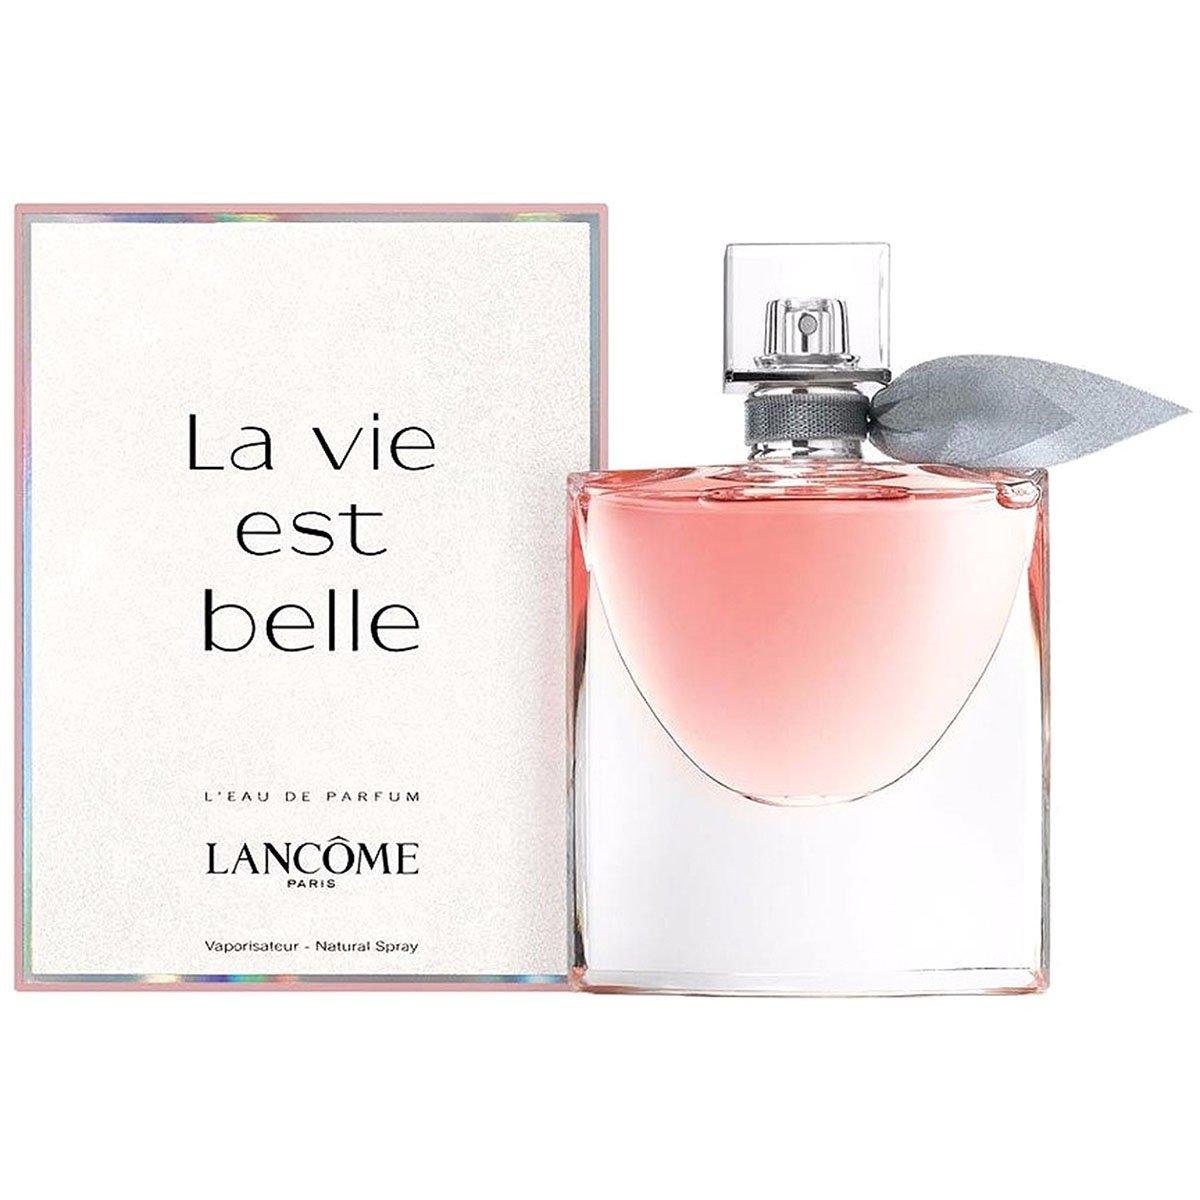 Lancôme Perfume Feminino La Vie Est Belle EDP 100ml - Incolor